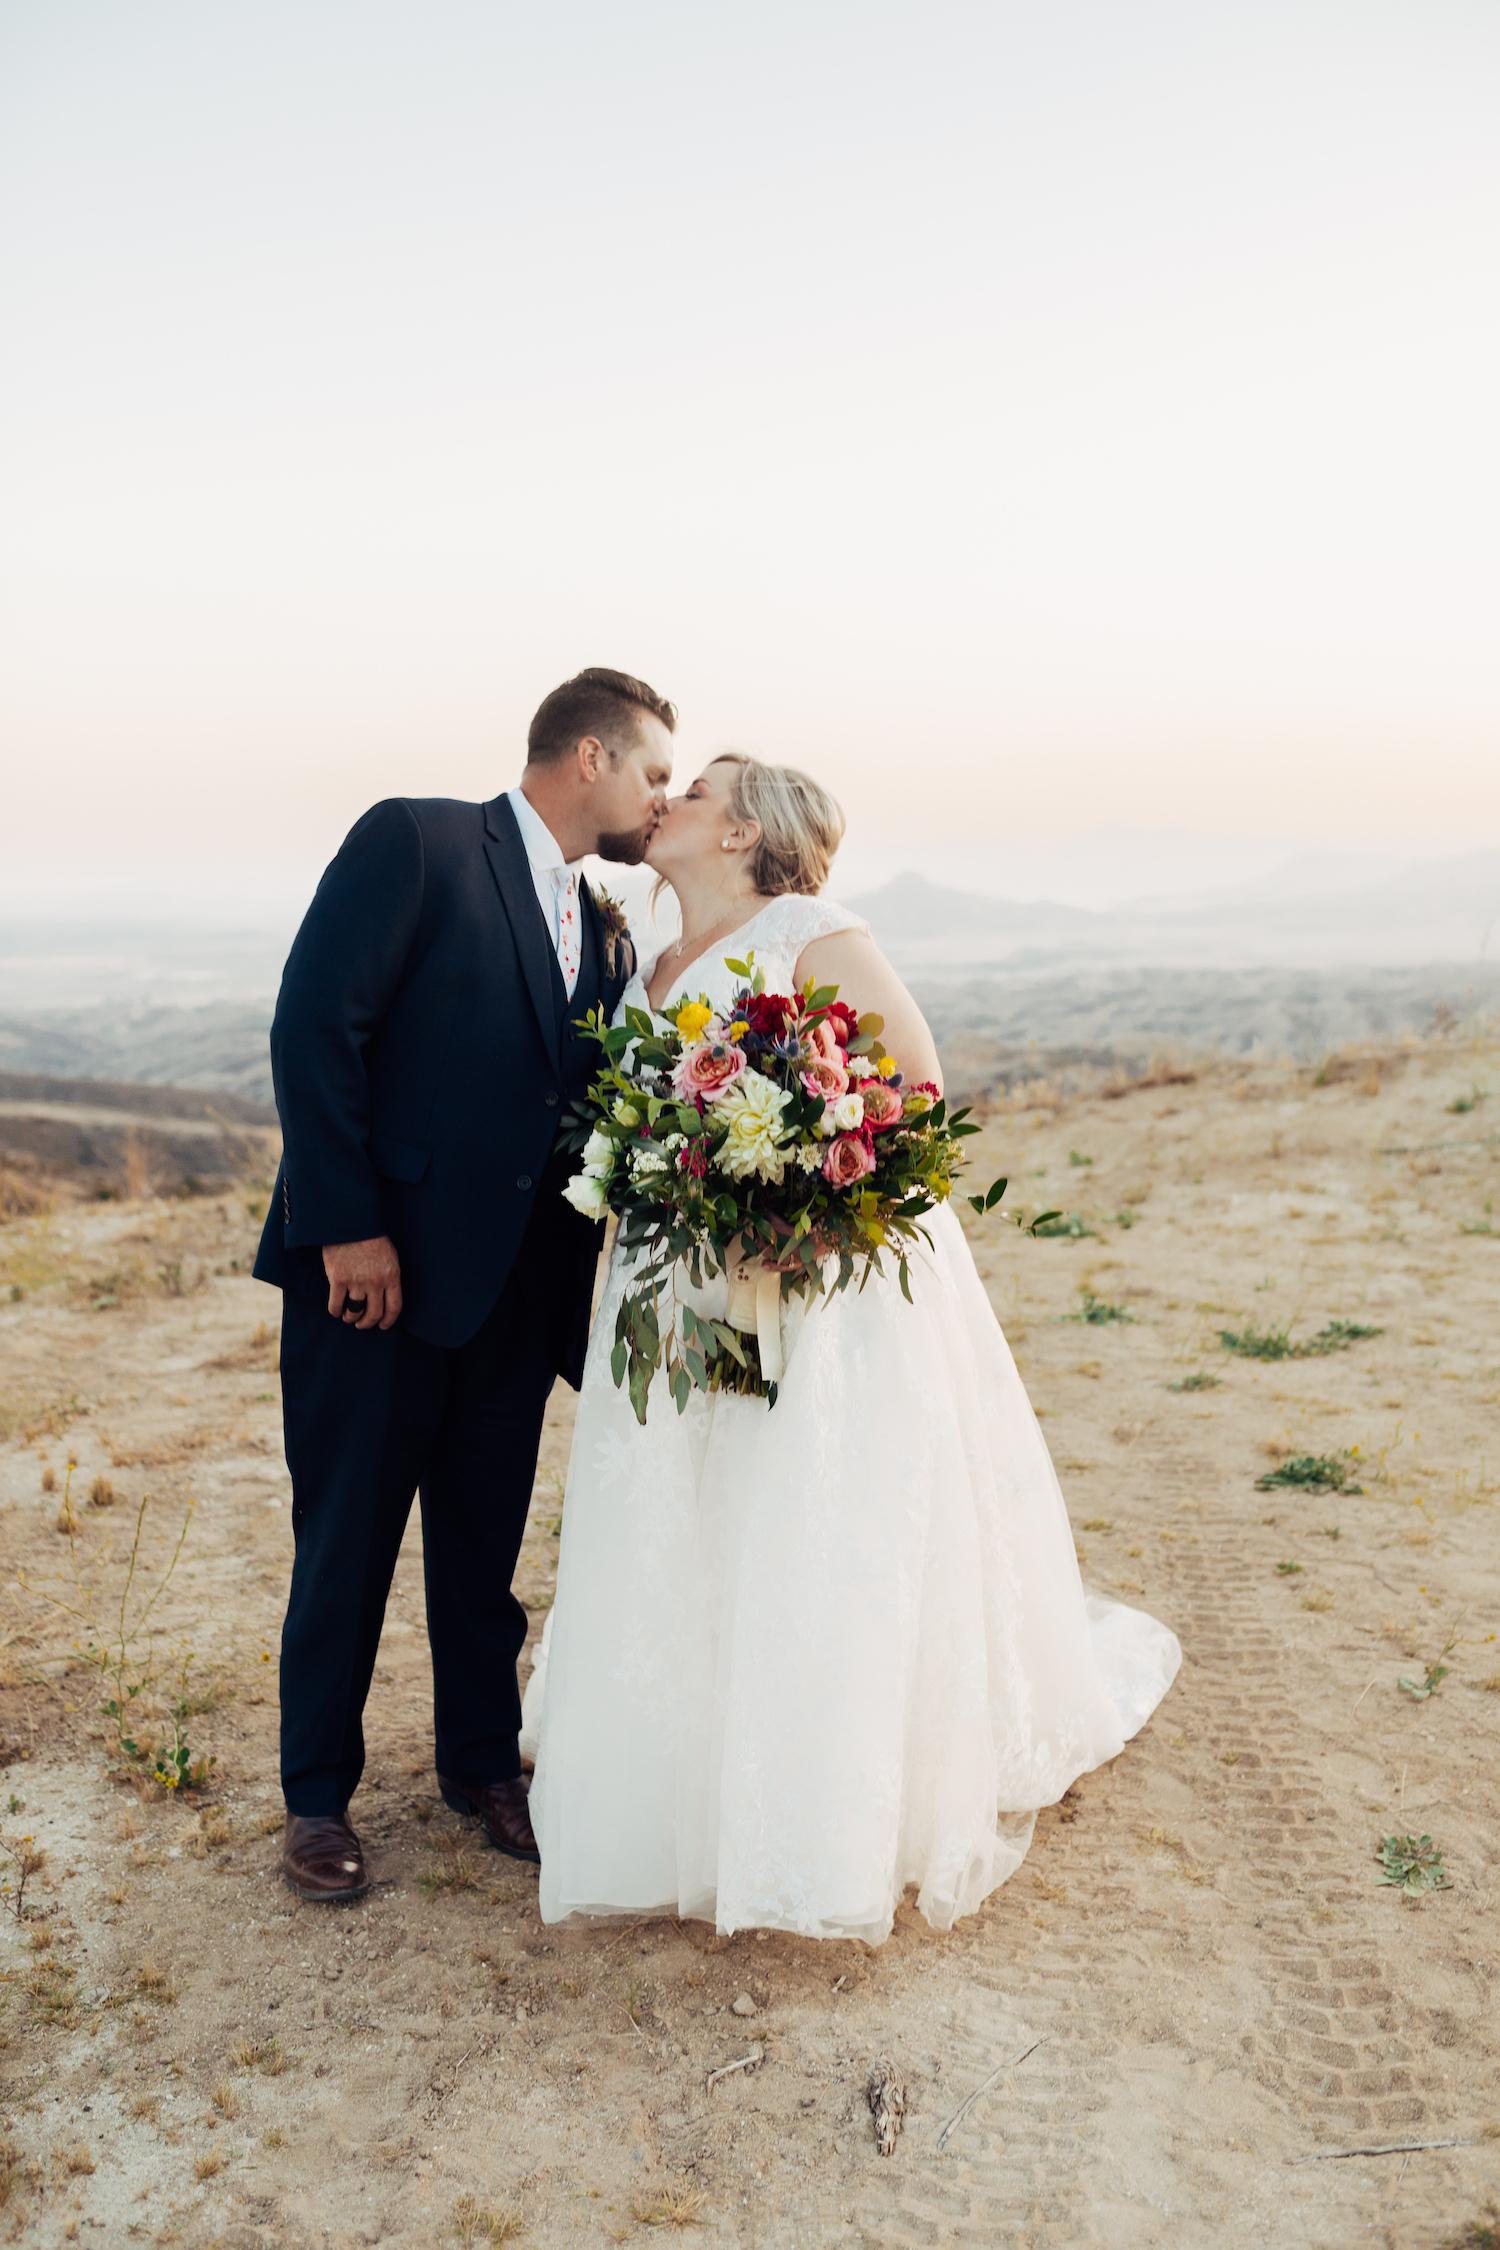 Catie & Andrew Sunset Kiss Bouquet .jpg